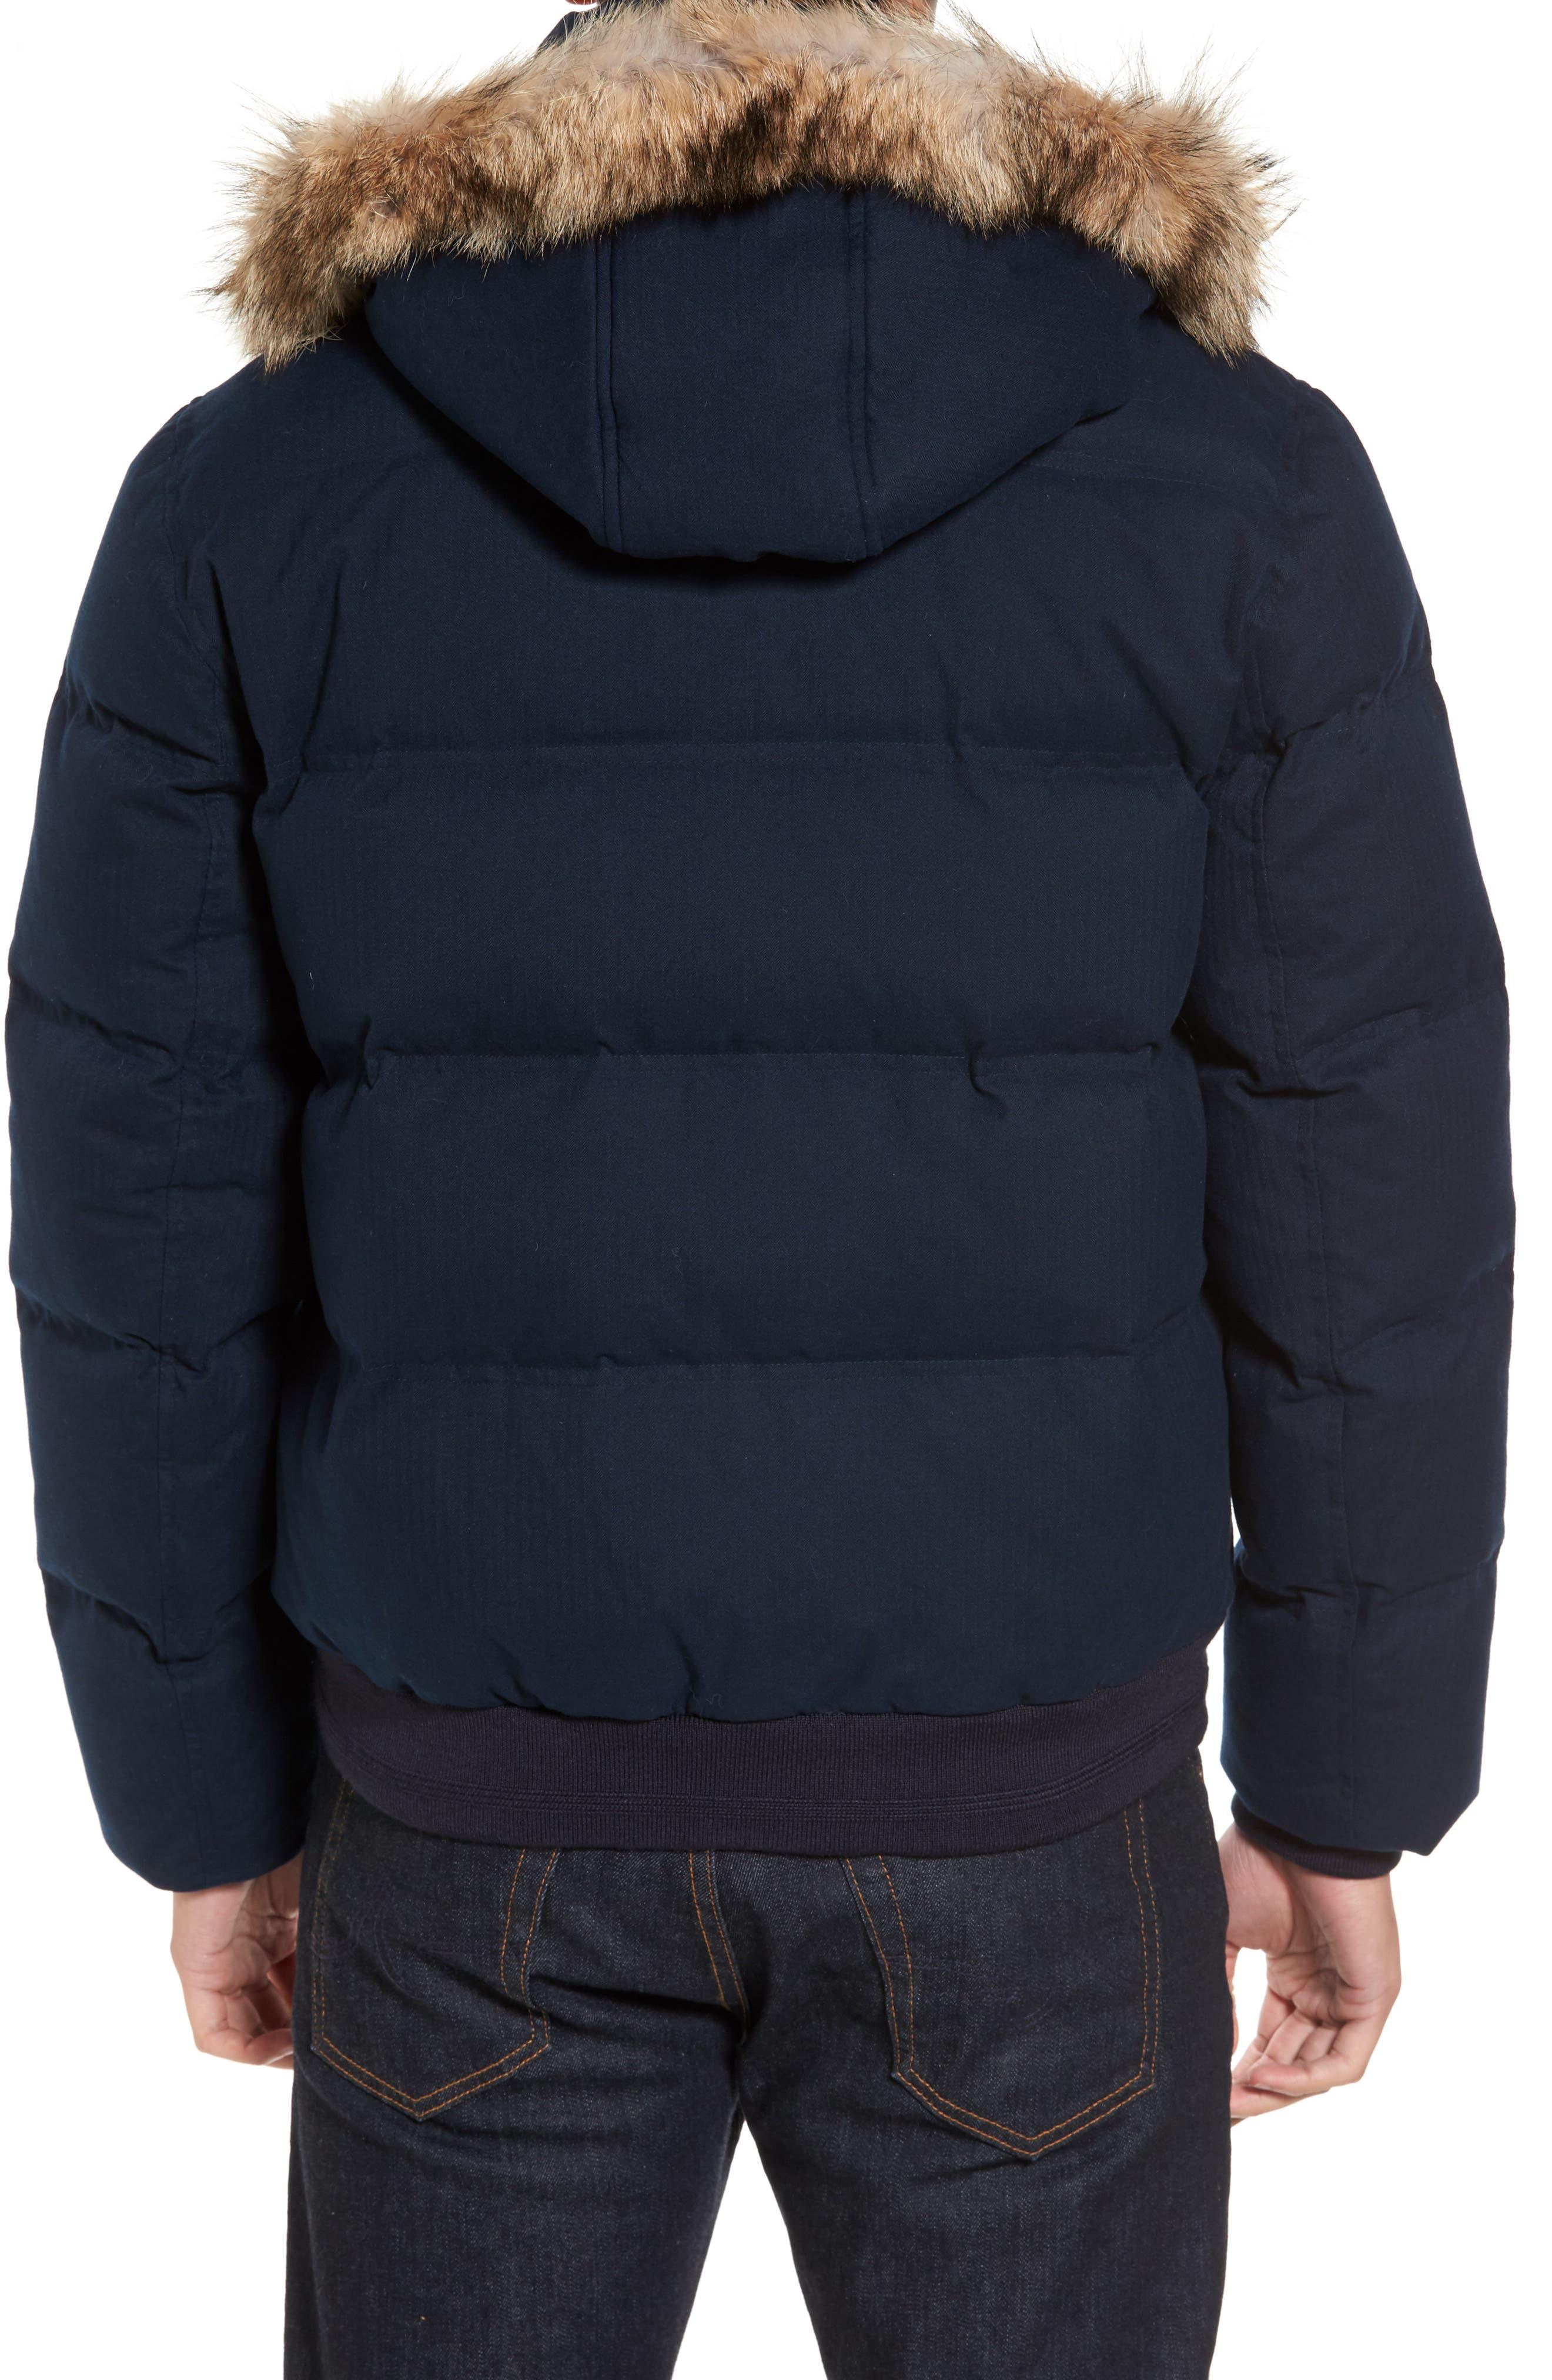 Alternate Image 2  - Marc New York Down Herringbone Jacket with Genuine Coyote Fur Trim